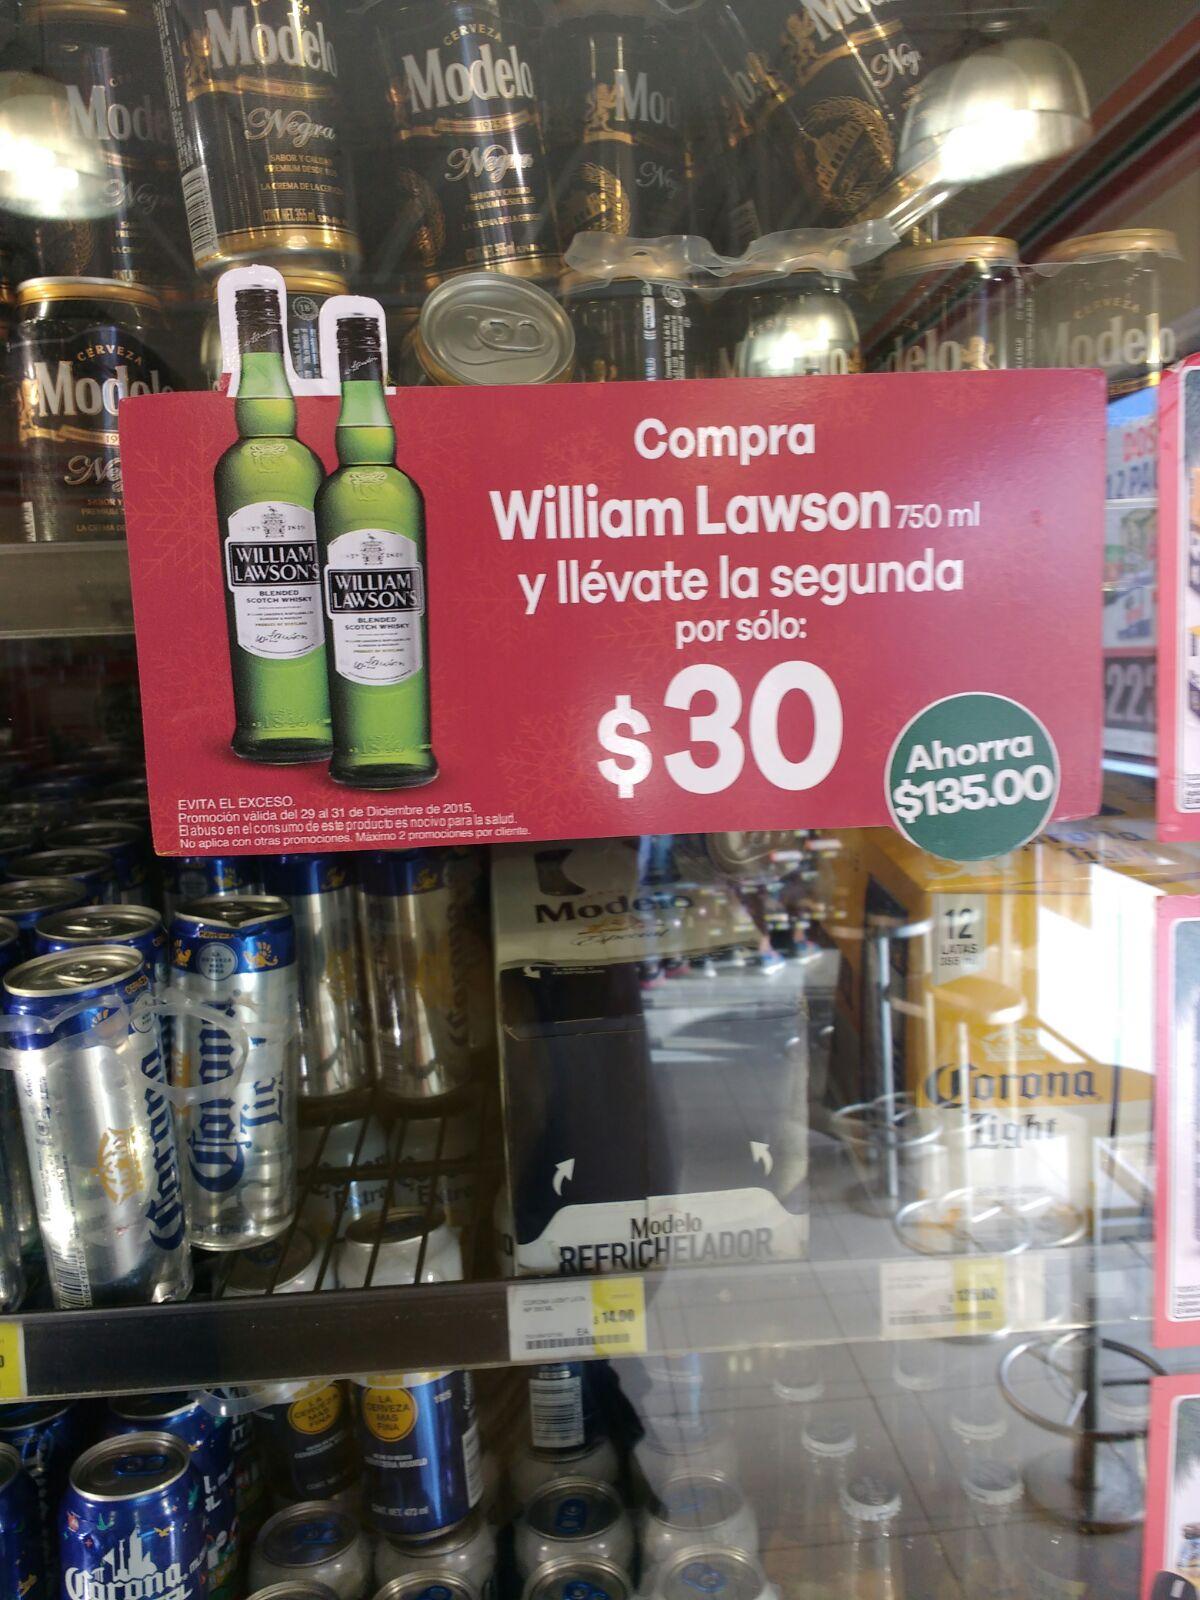 Seven Eleven: Dos Botellas William Lawson por $195